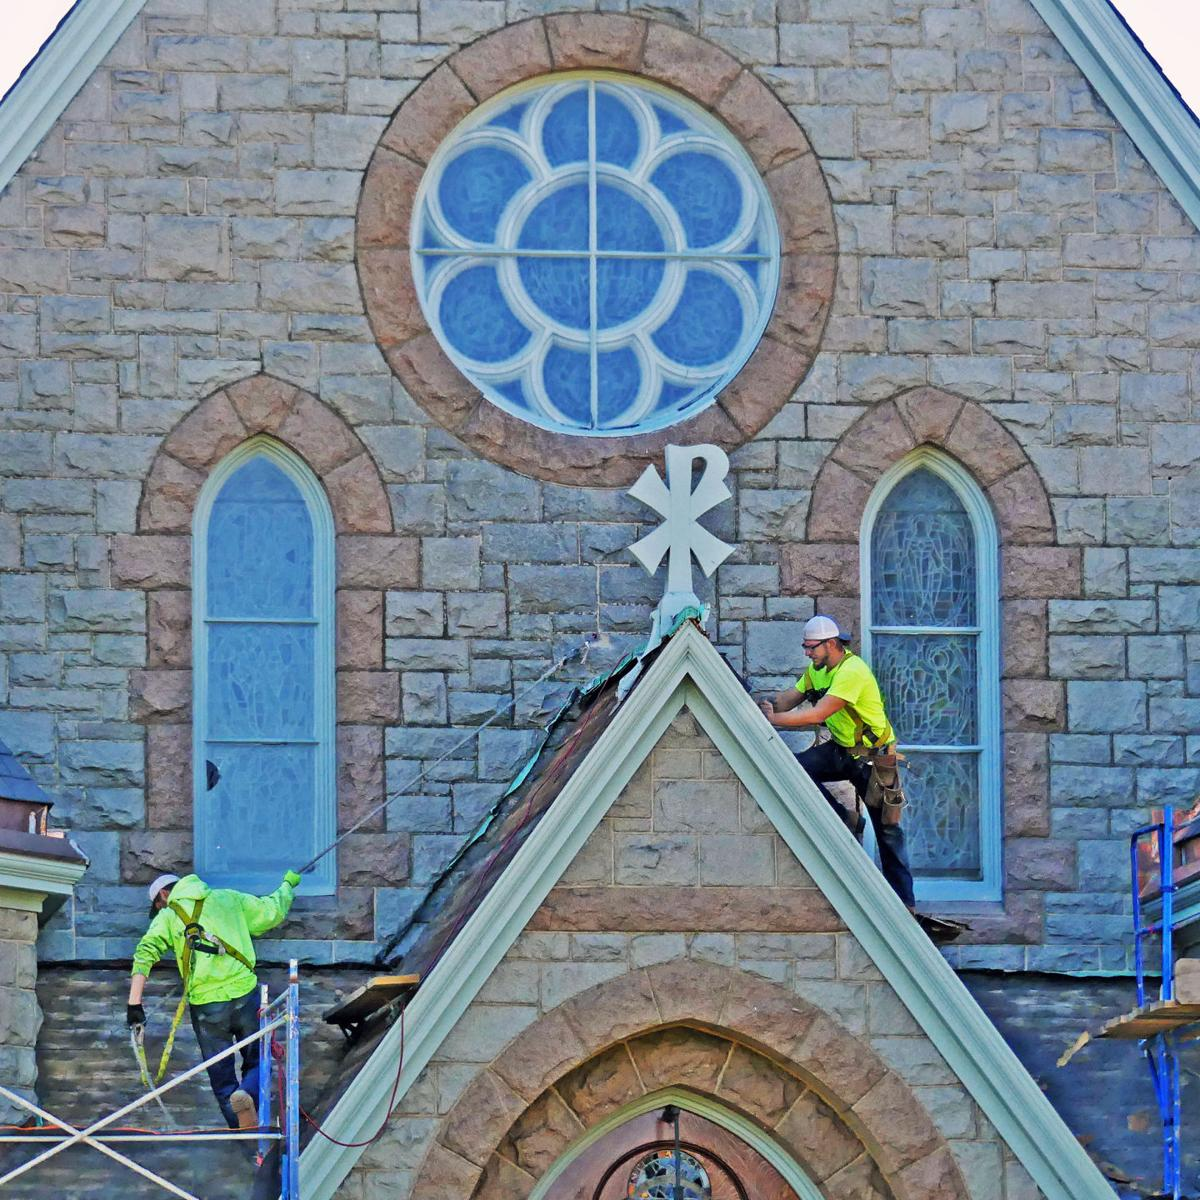 102319 WES IChrist Church roofers 321.JPG